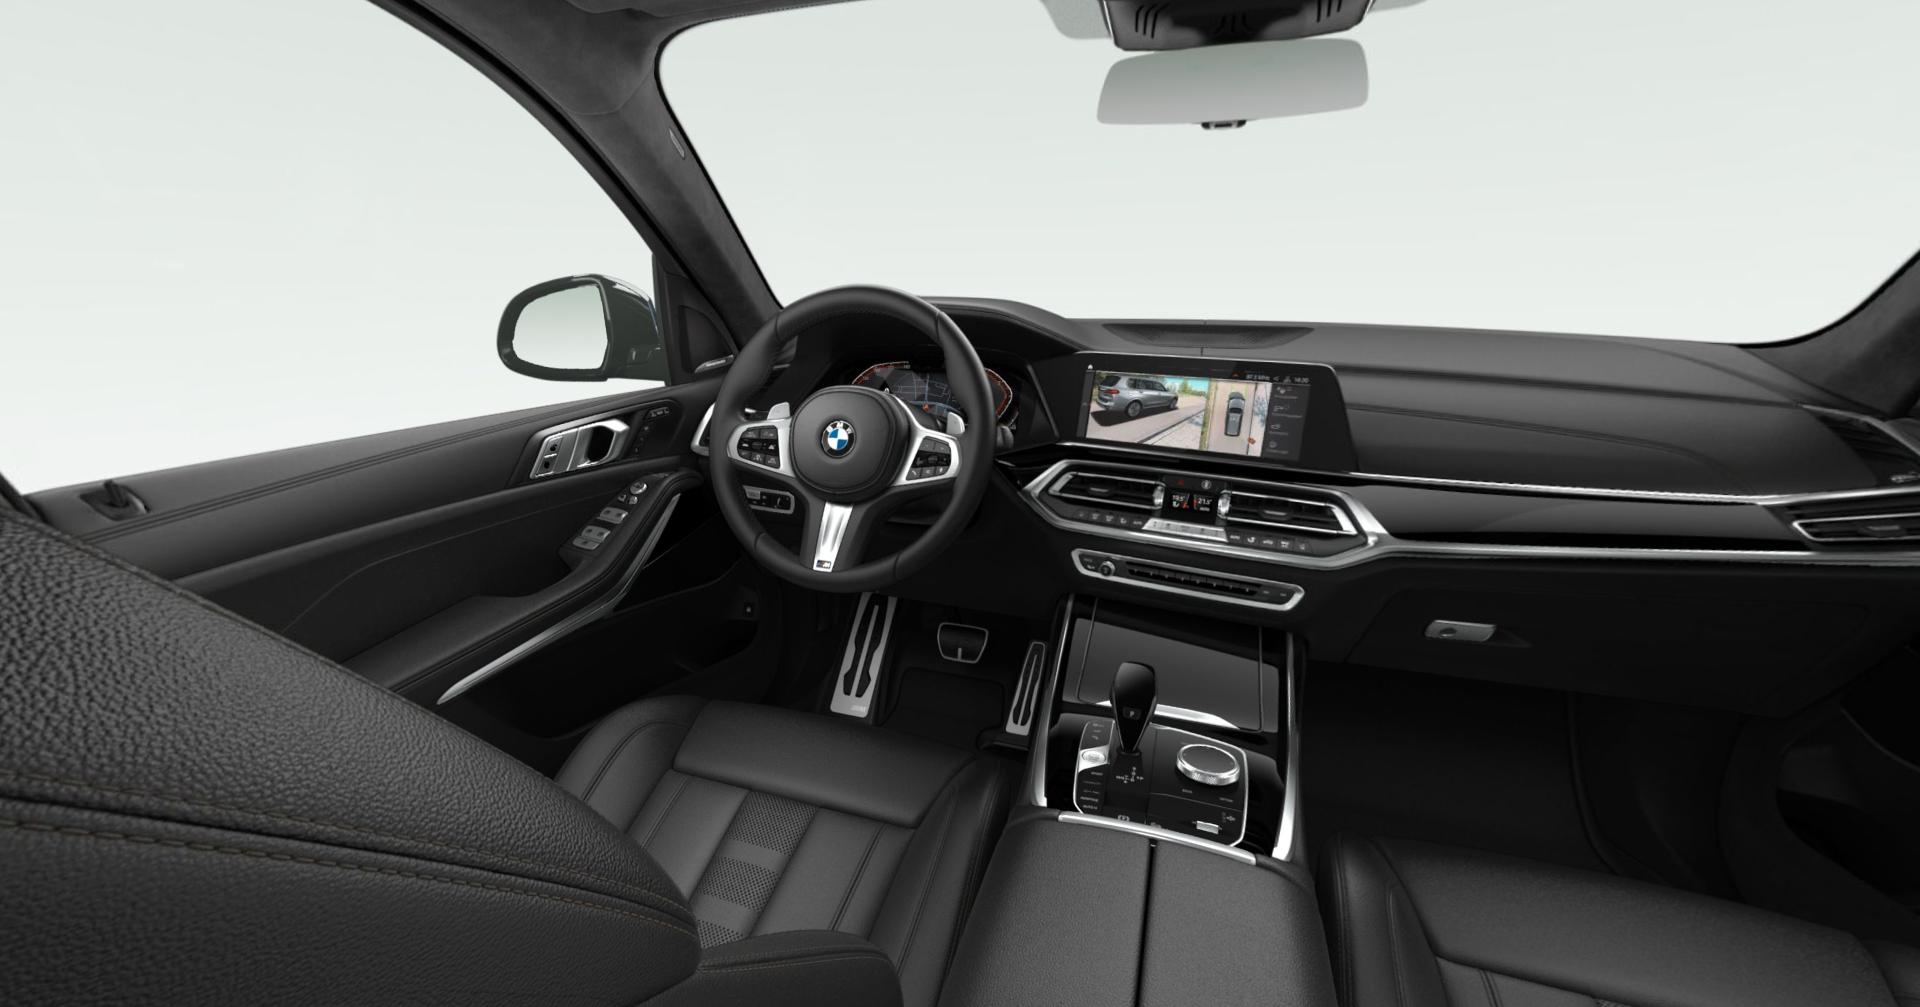 BMW X7 40d xDrive Mpaket - nové auto skladem, nákup online